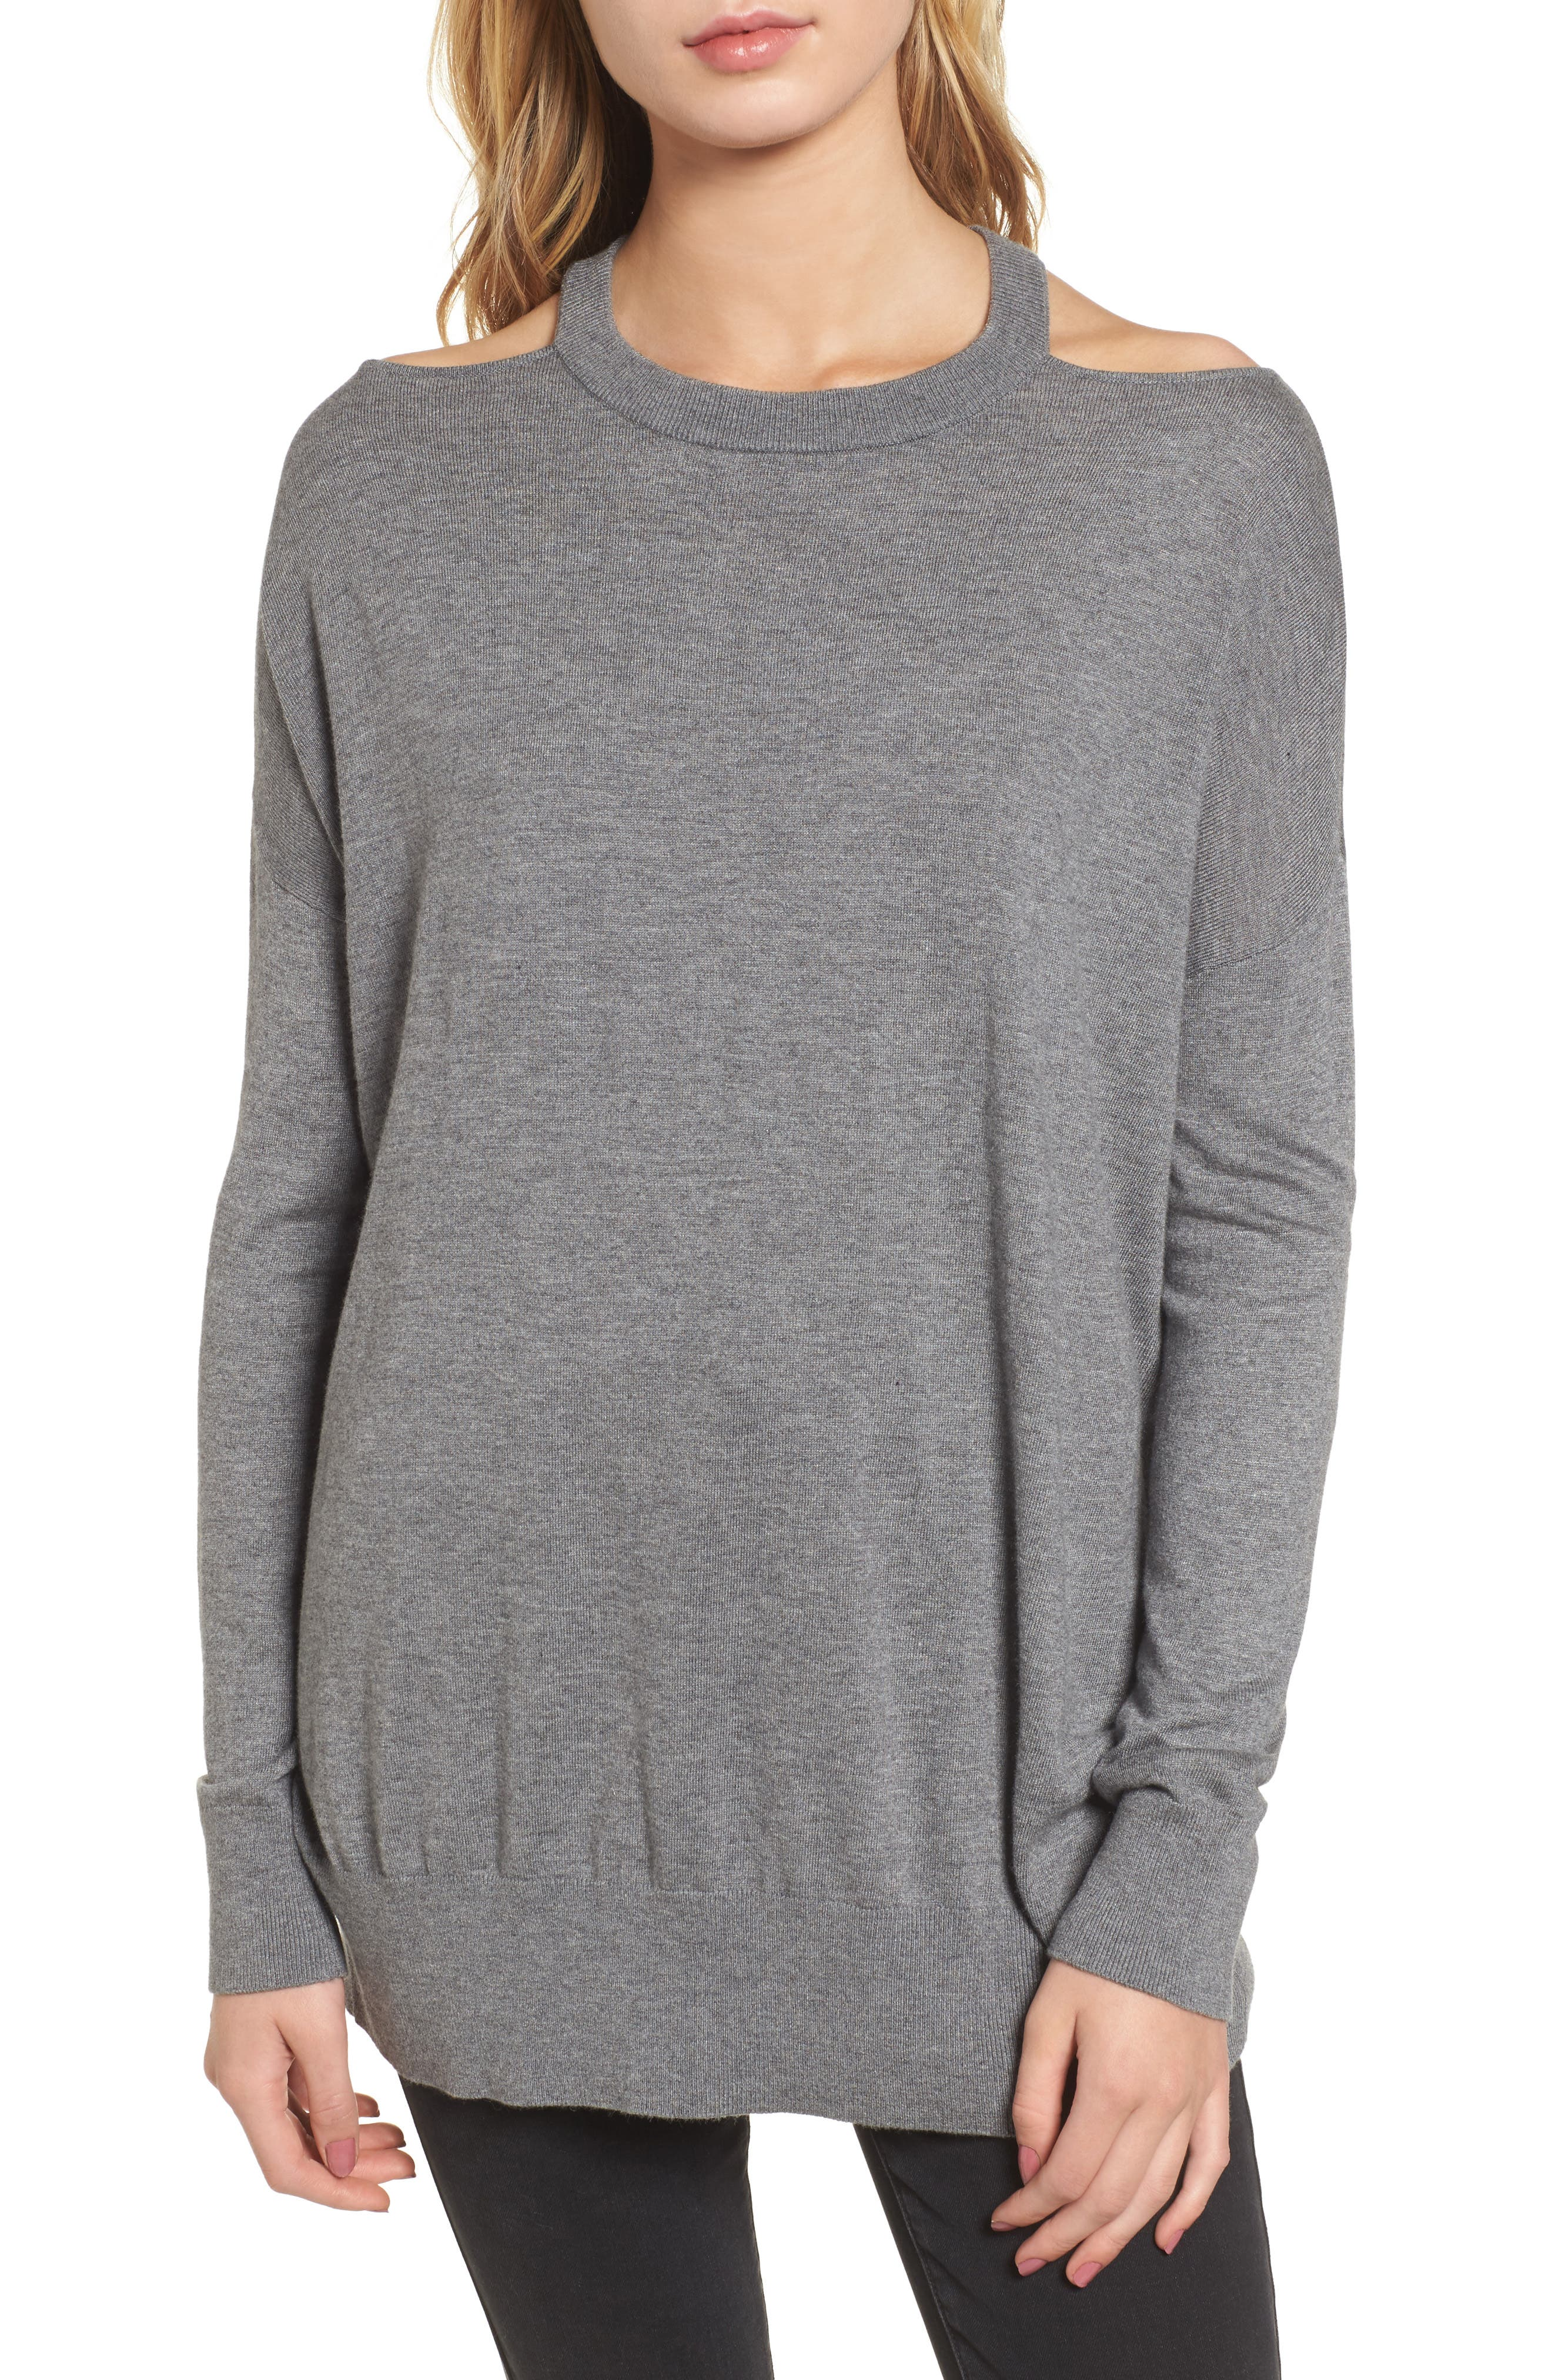 Canarise Cutout Sweater,                         Main,                         color,